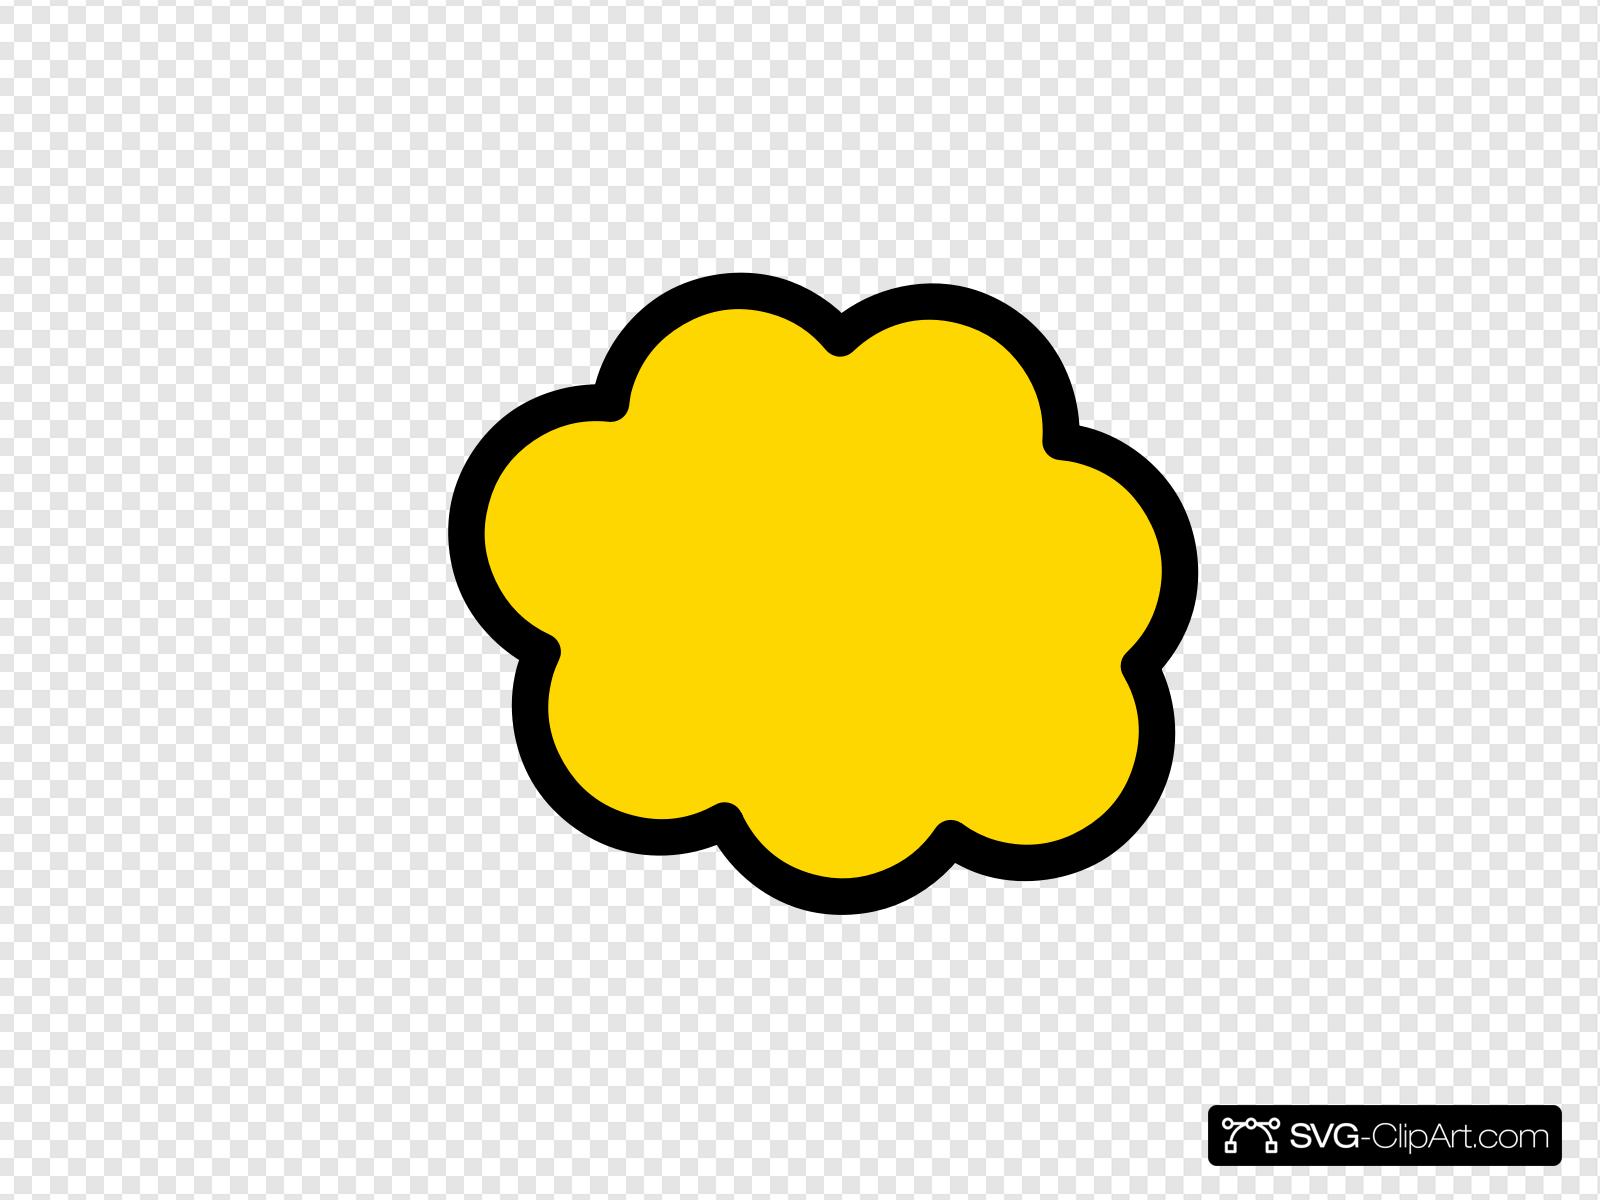 Yellow cloud clipart clip transparent stock Orange-yellow Cloud Clip art, Icon and SVG - SVG Clipart clip transparent stock